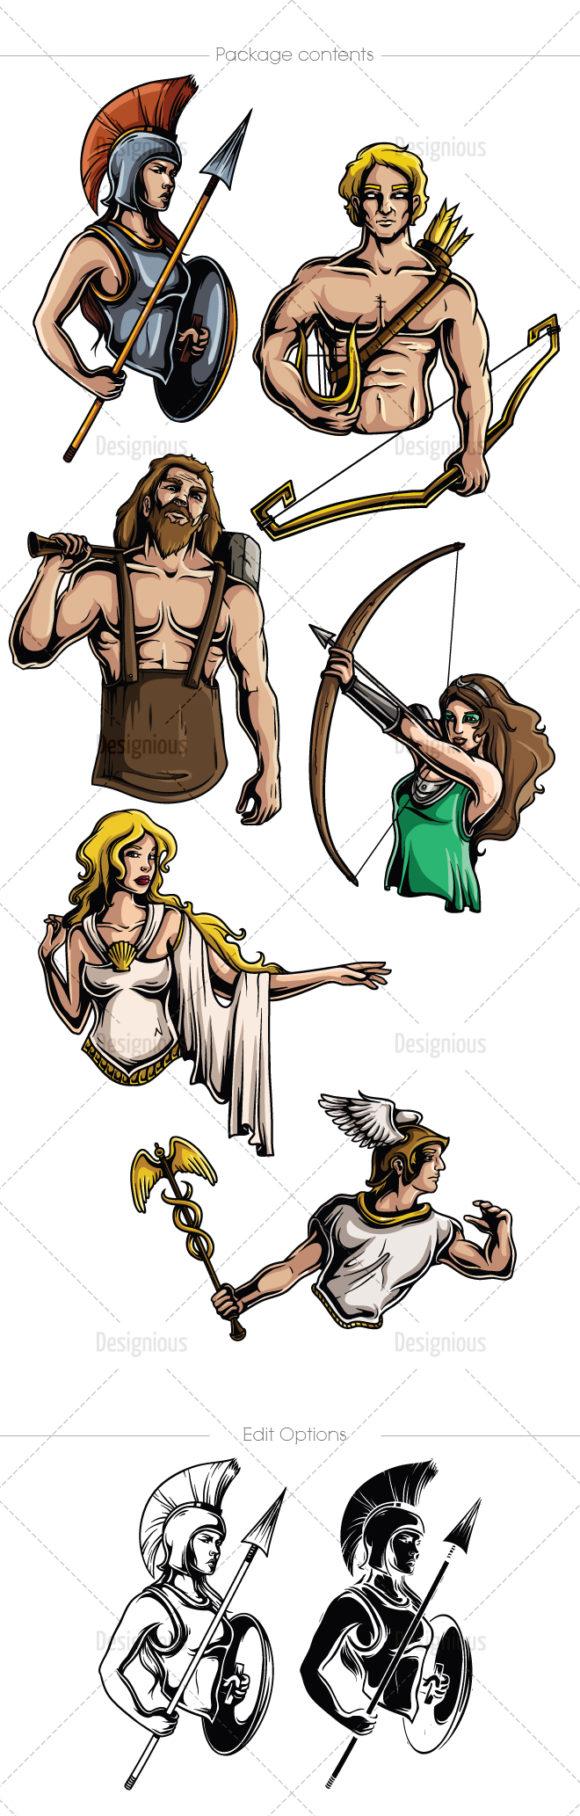 Greek Mythological Olympian Gods Vector Pack 2 6